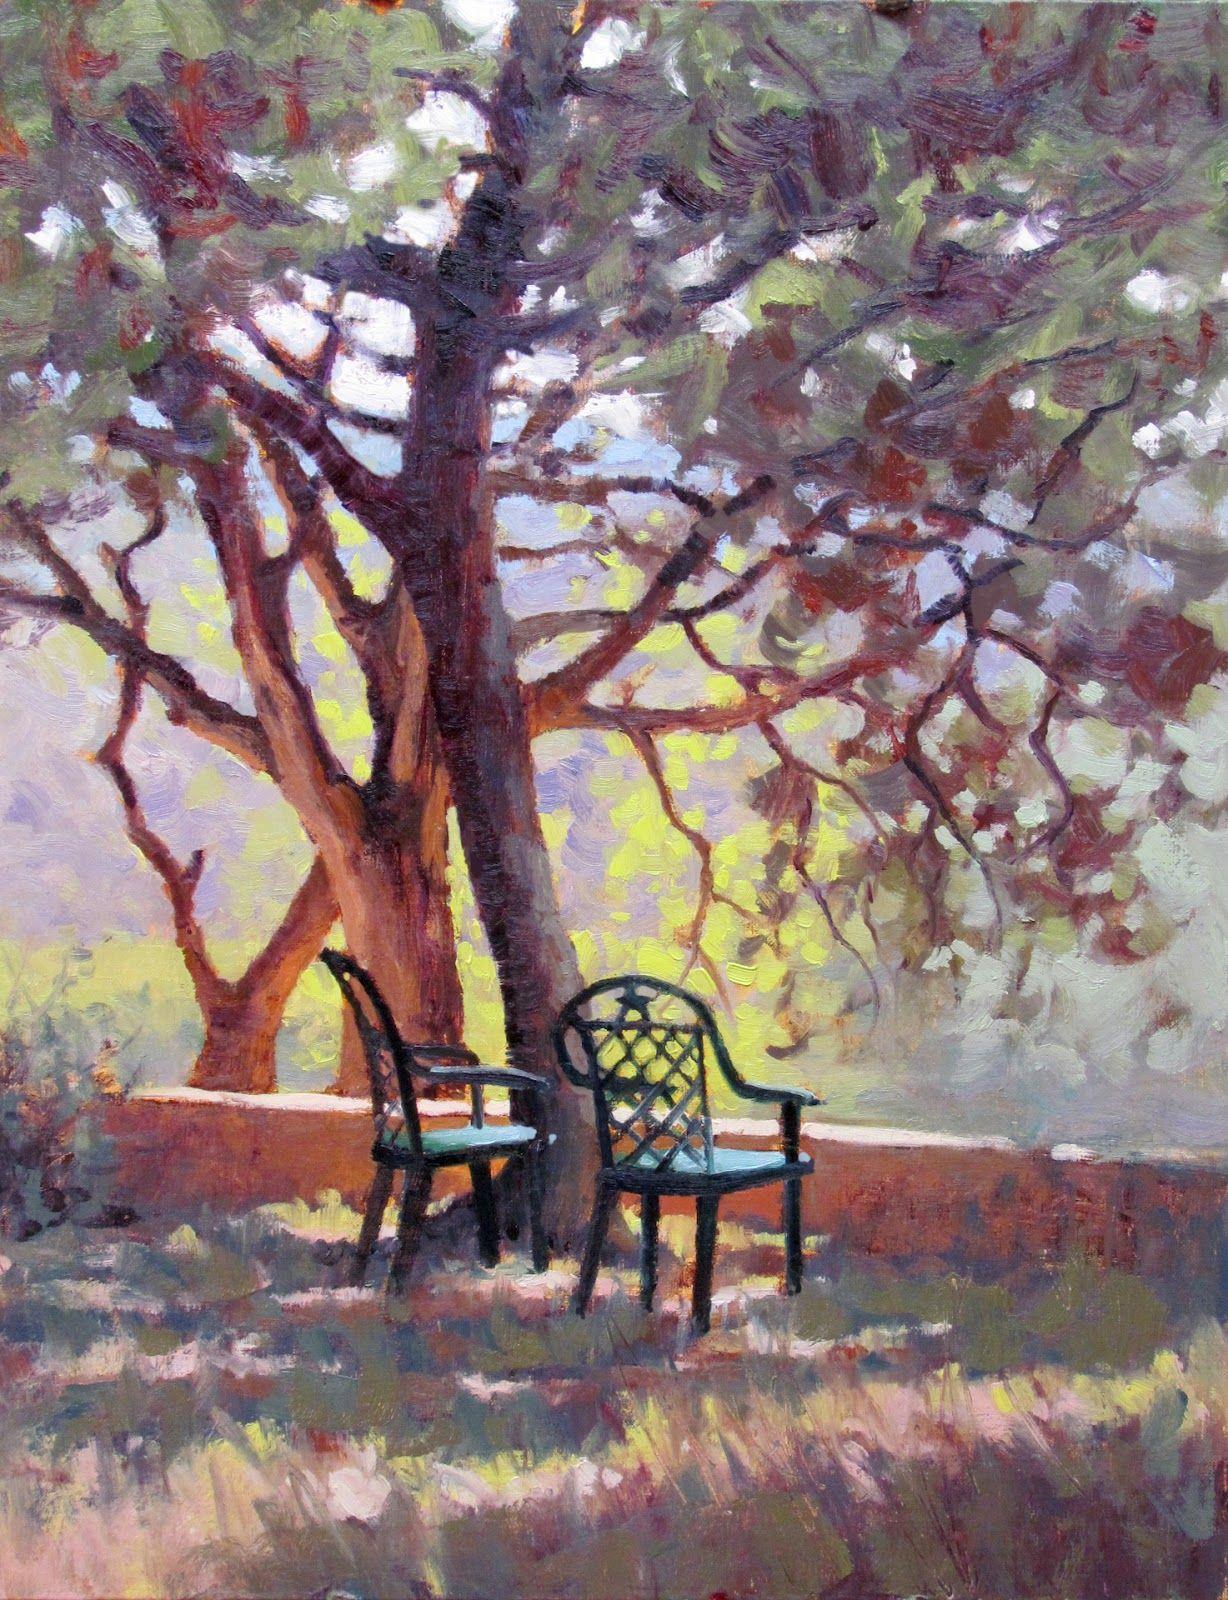 """HILLTOP PERCH"" plein air and studio landscape painting"